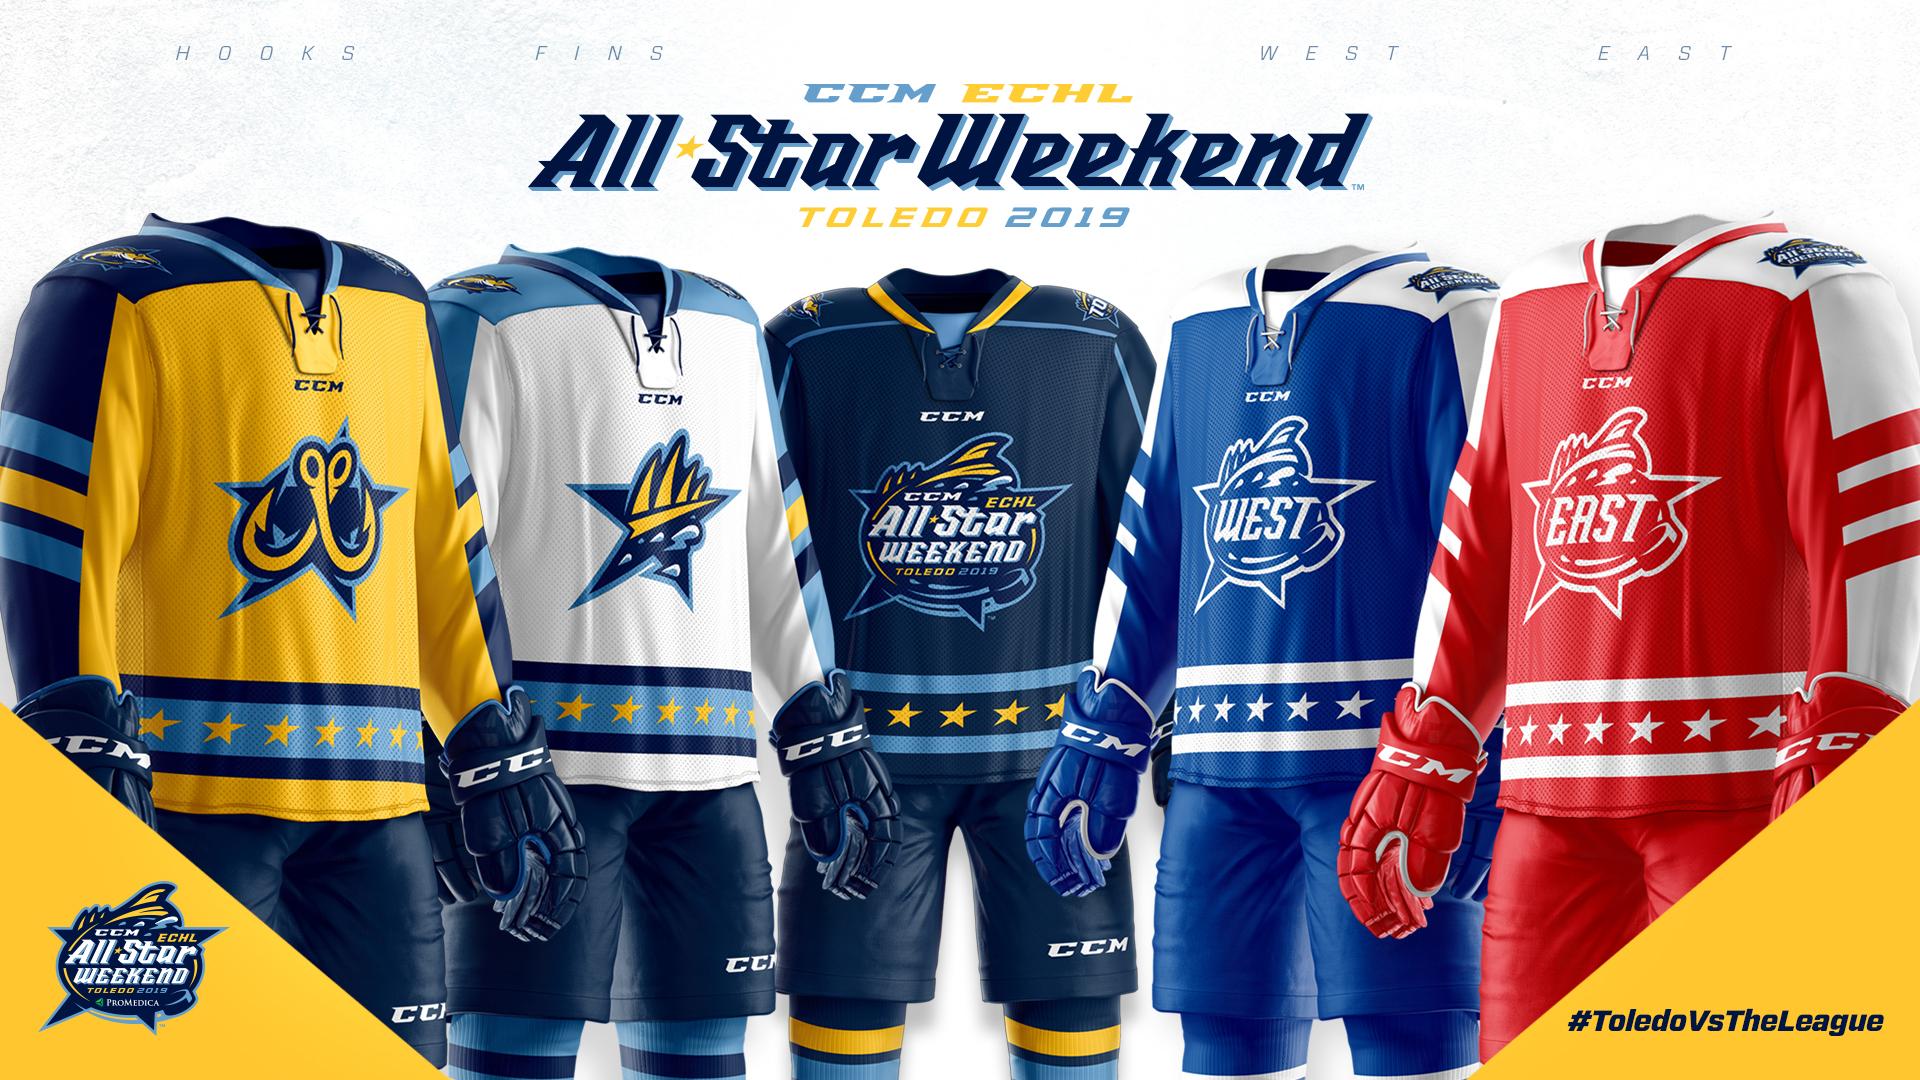 finest selection ea879 ad7e9 Inside the AHL, ECHL All-Star branding for 2019 — icethetics.co